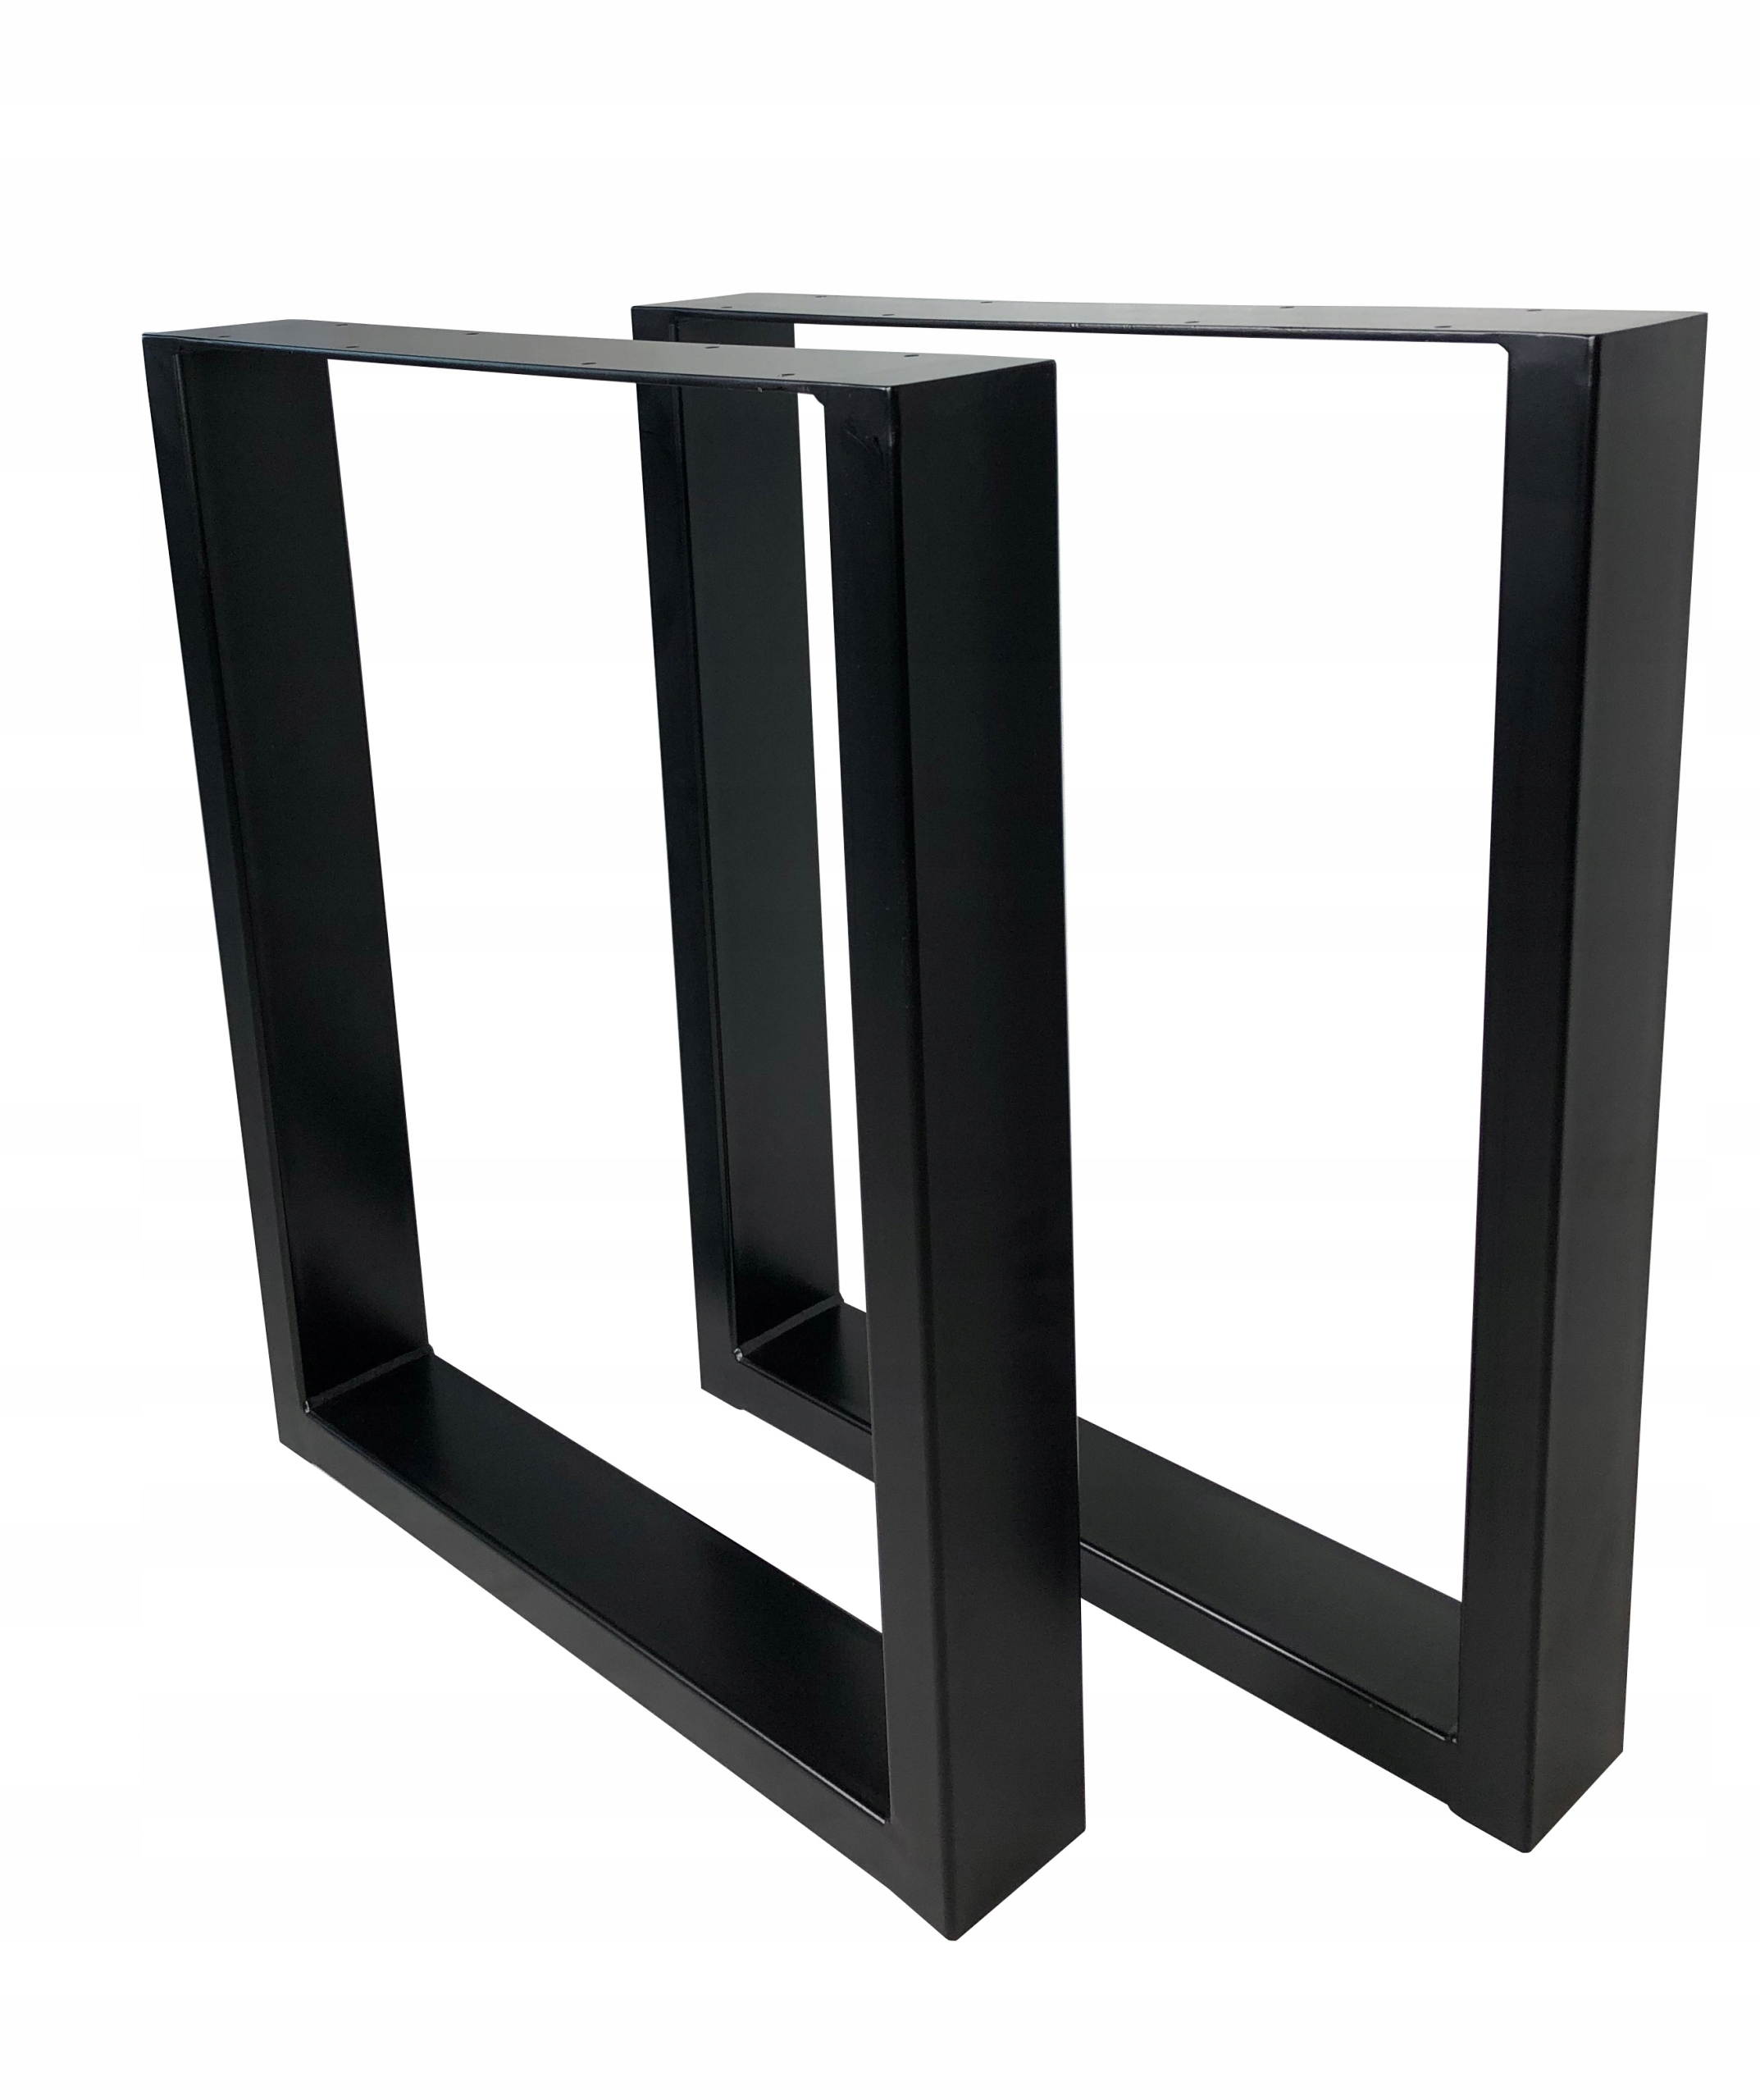 2x kovové stolové nohy čierne 60x72 cm (100x40)